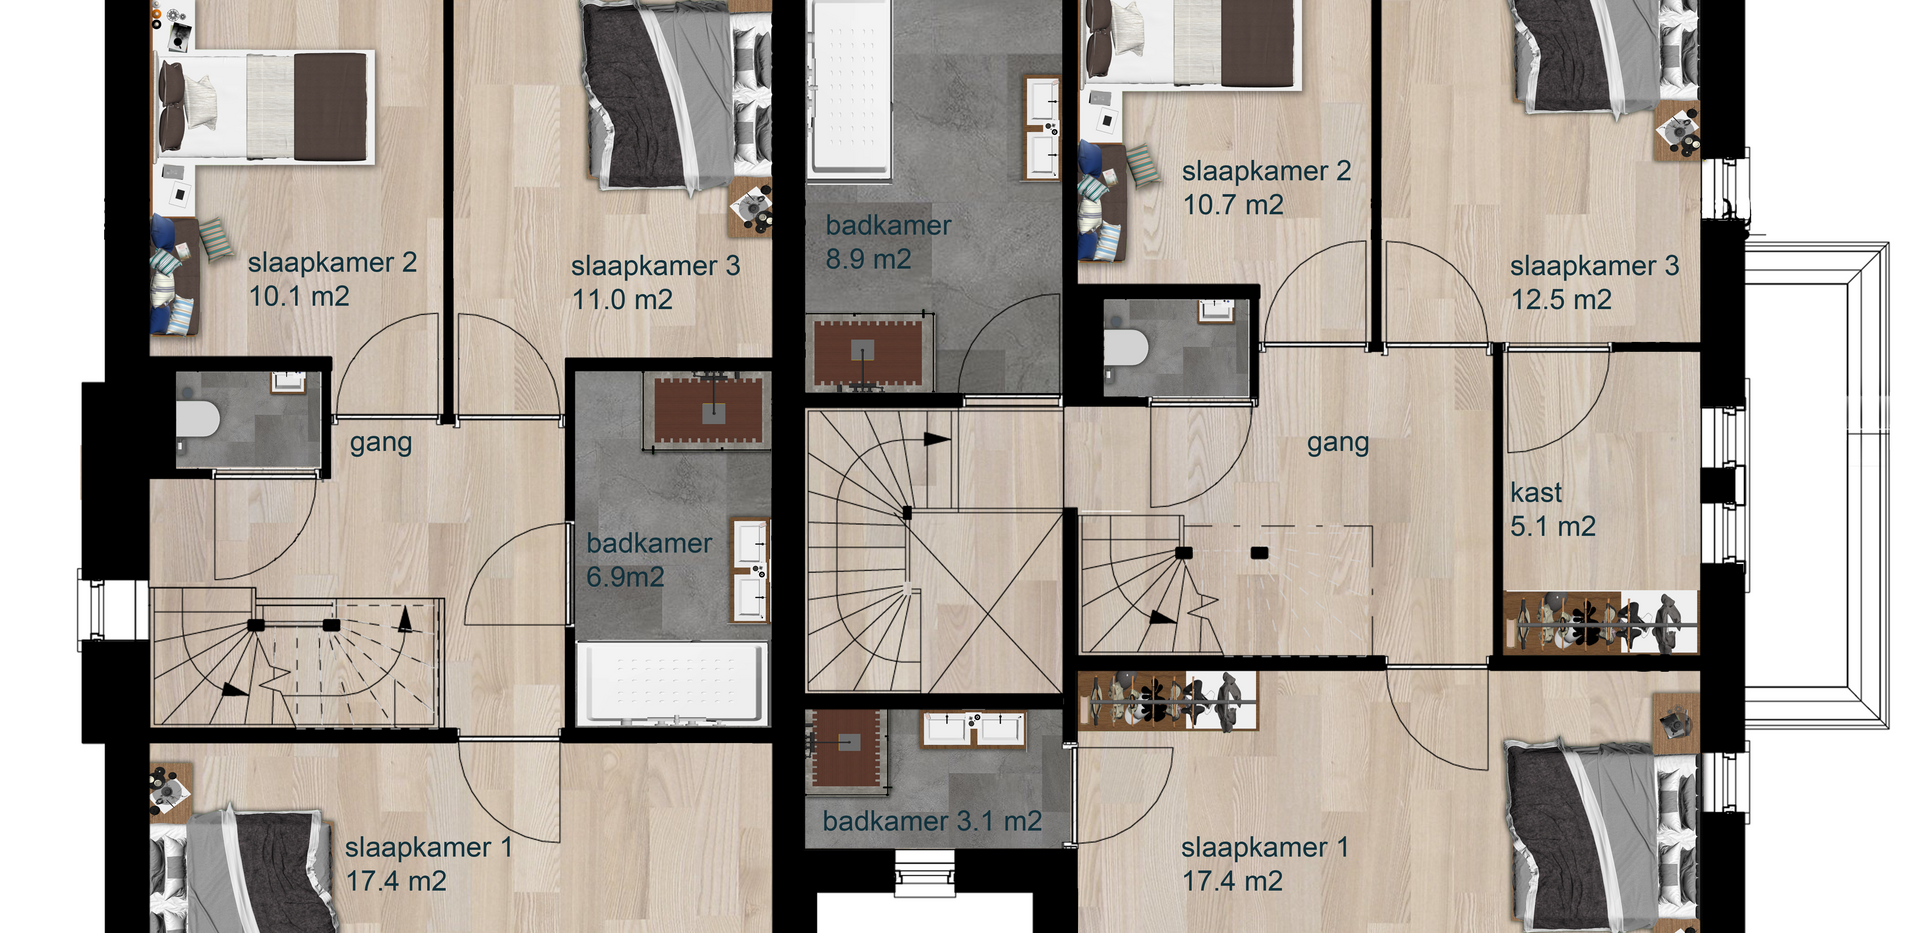 Verkoop plattegrond - 1e verdieping - Vi